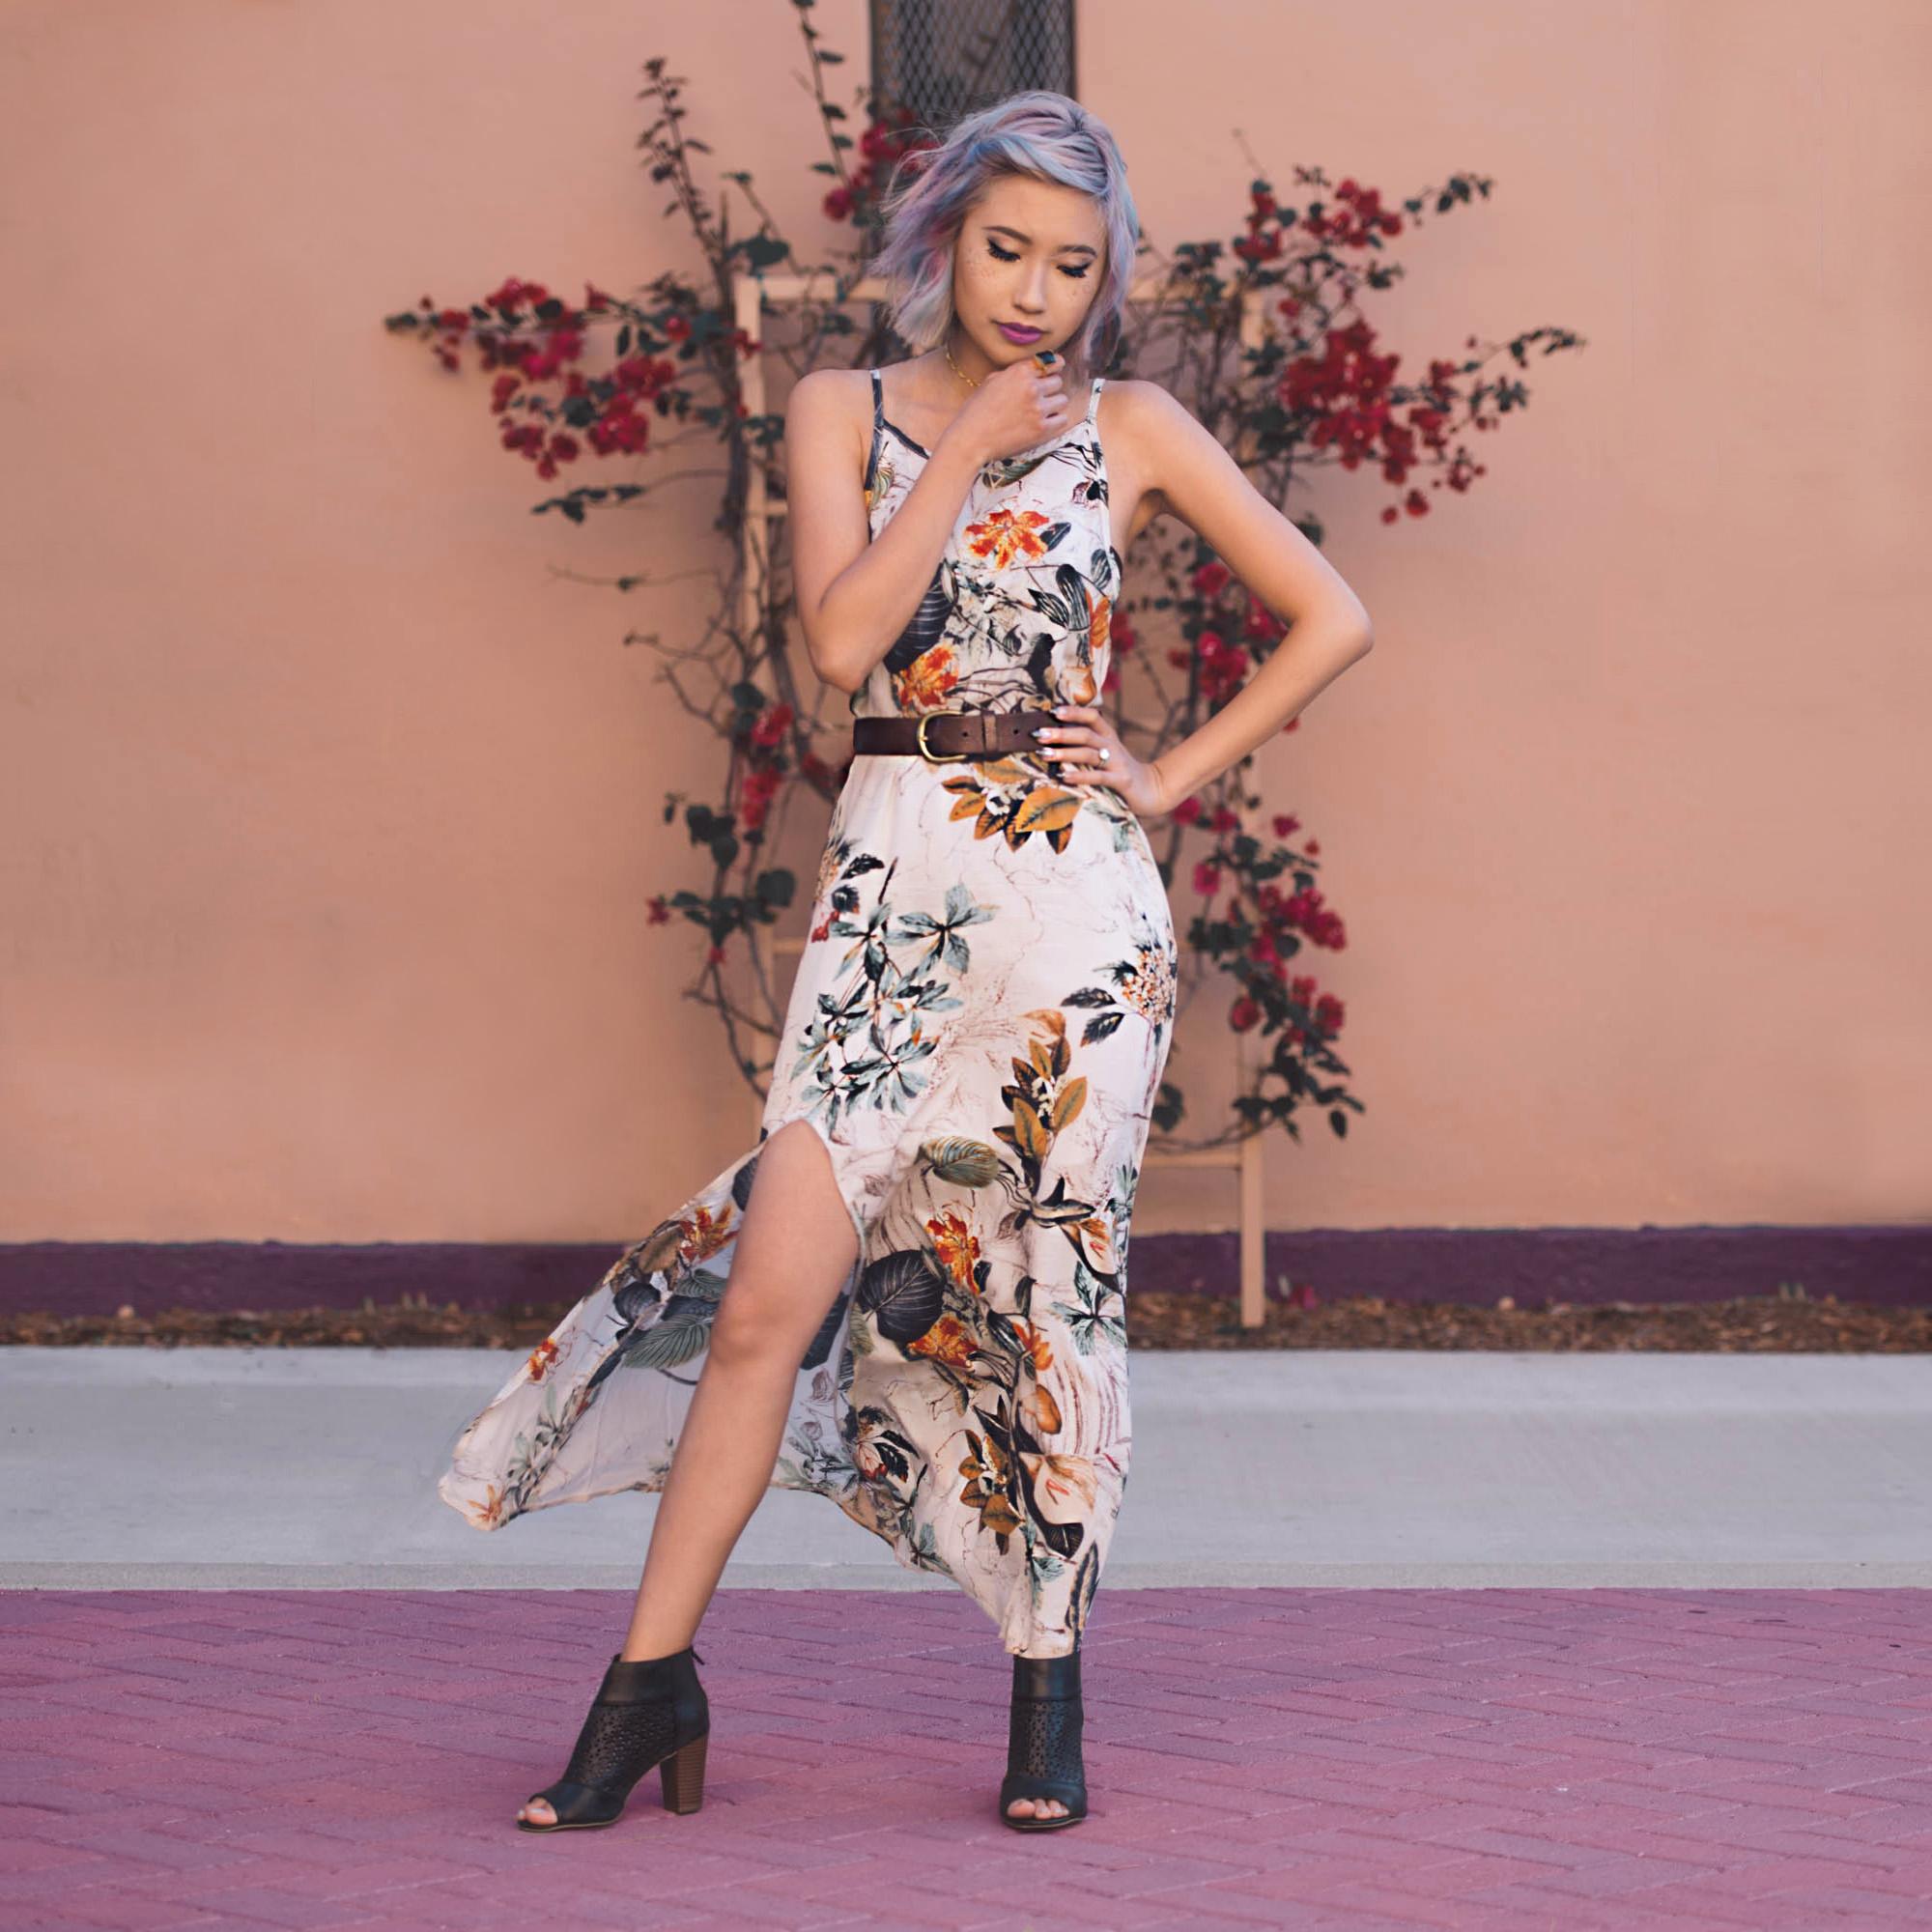 Dress :  White Spaghetti Strap Backless Split Dress